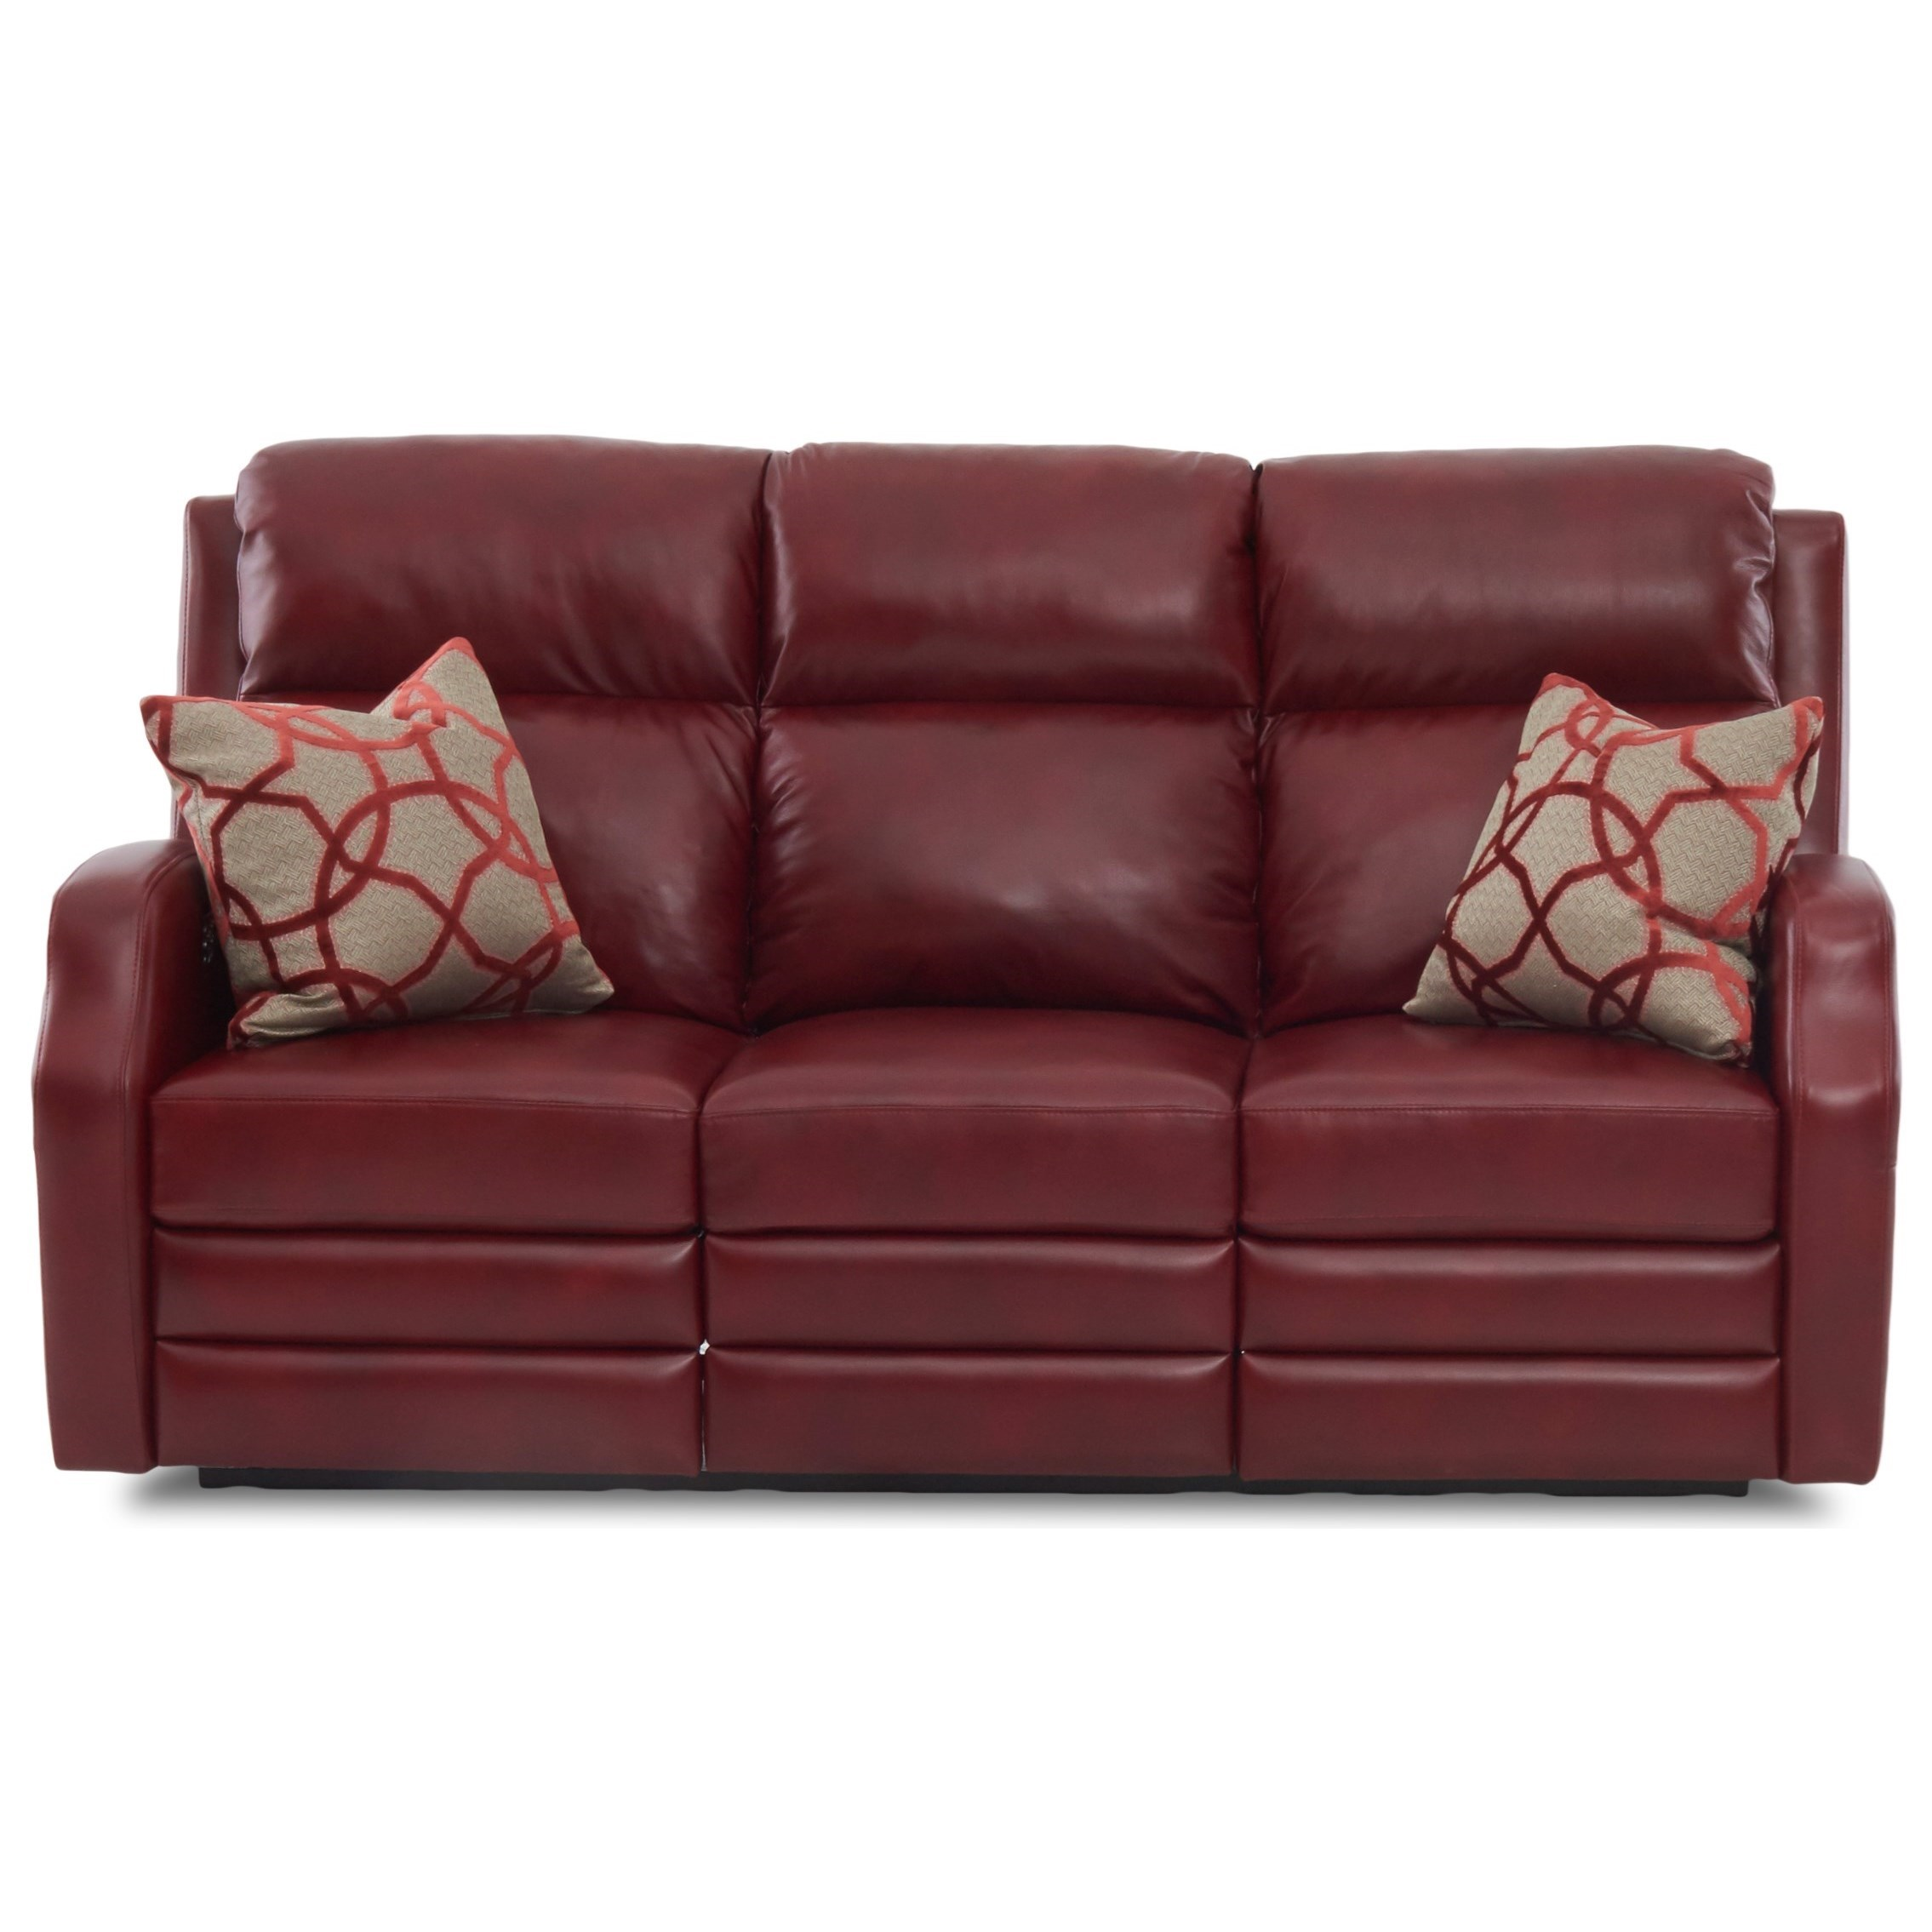 Klaussner Kamiah 77 Inch Reclining Sofa With Pillows